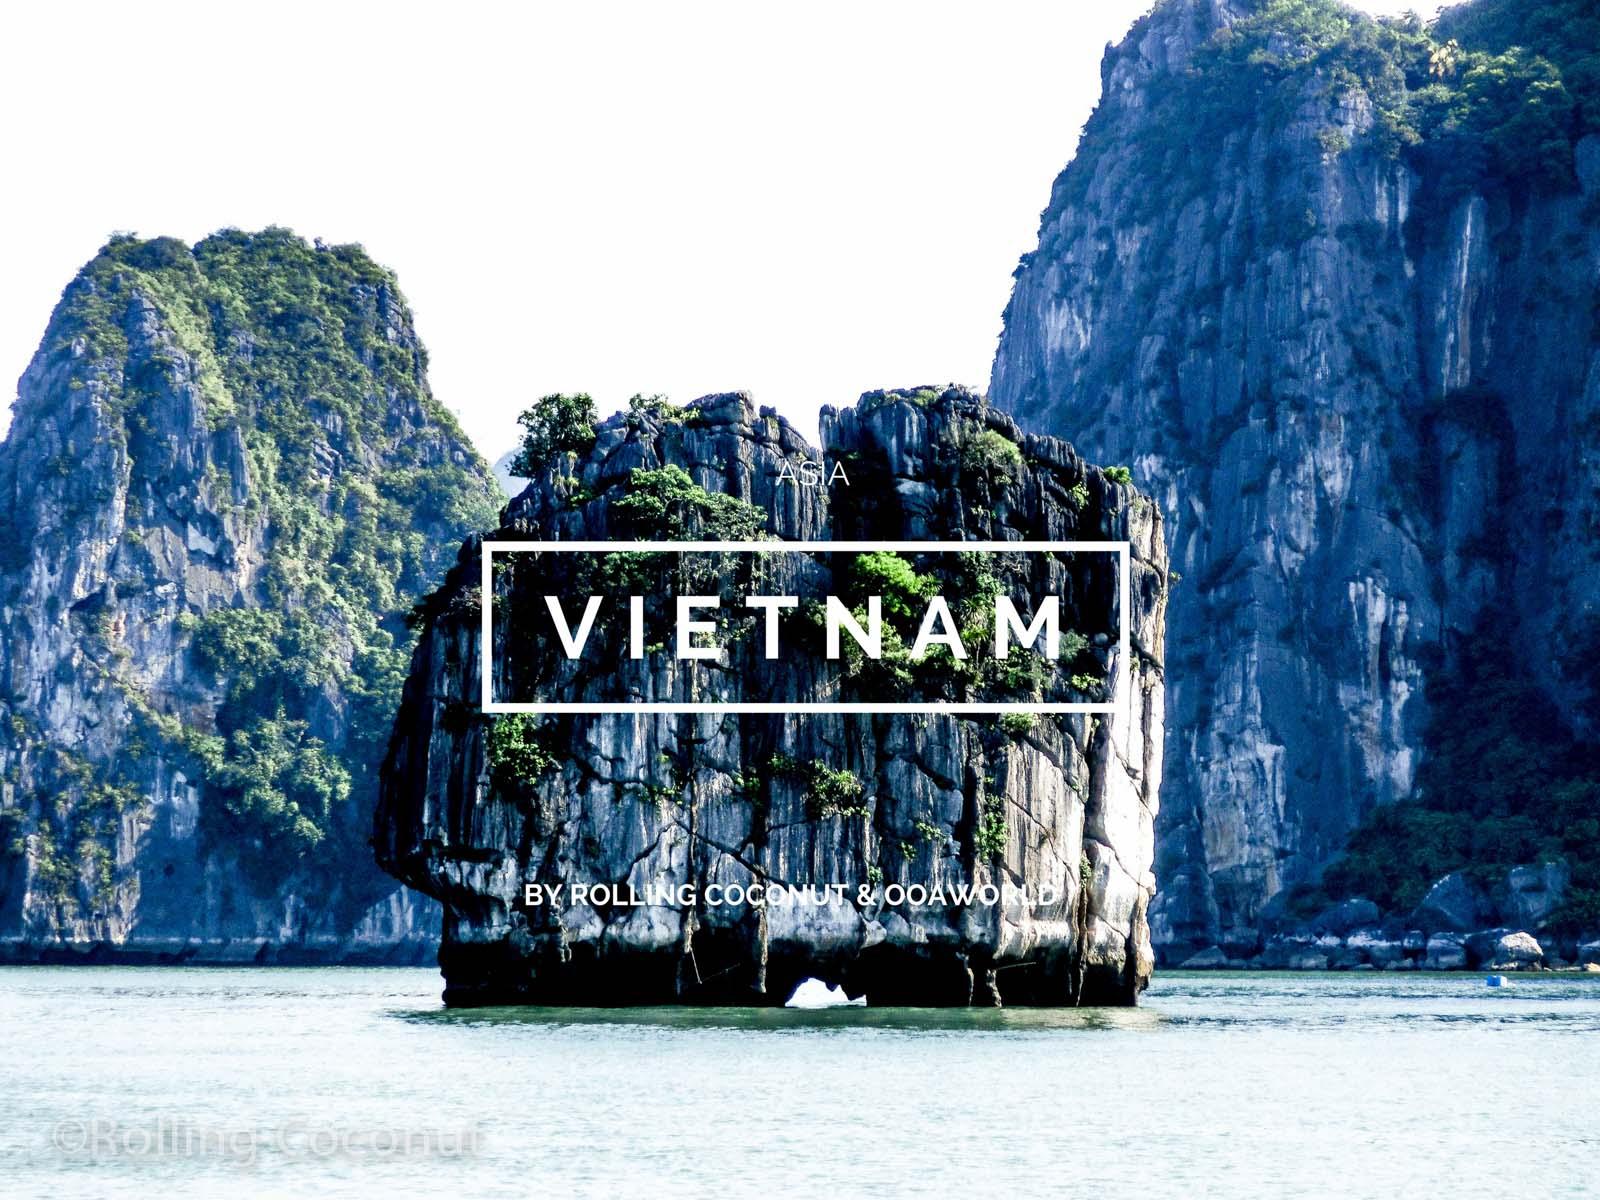 Vietnam Travel Ooaworld Rolling Coconut photo Ooaworld